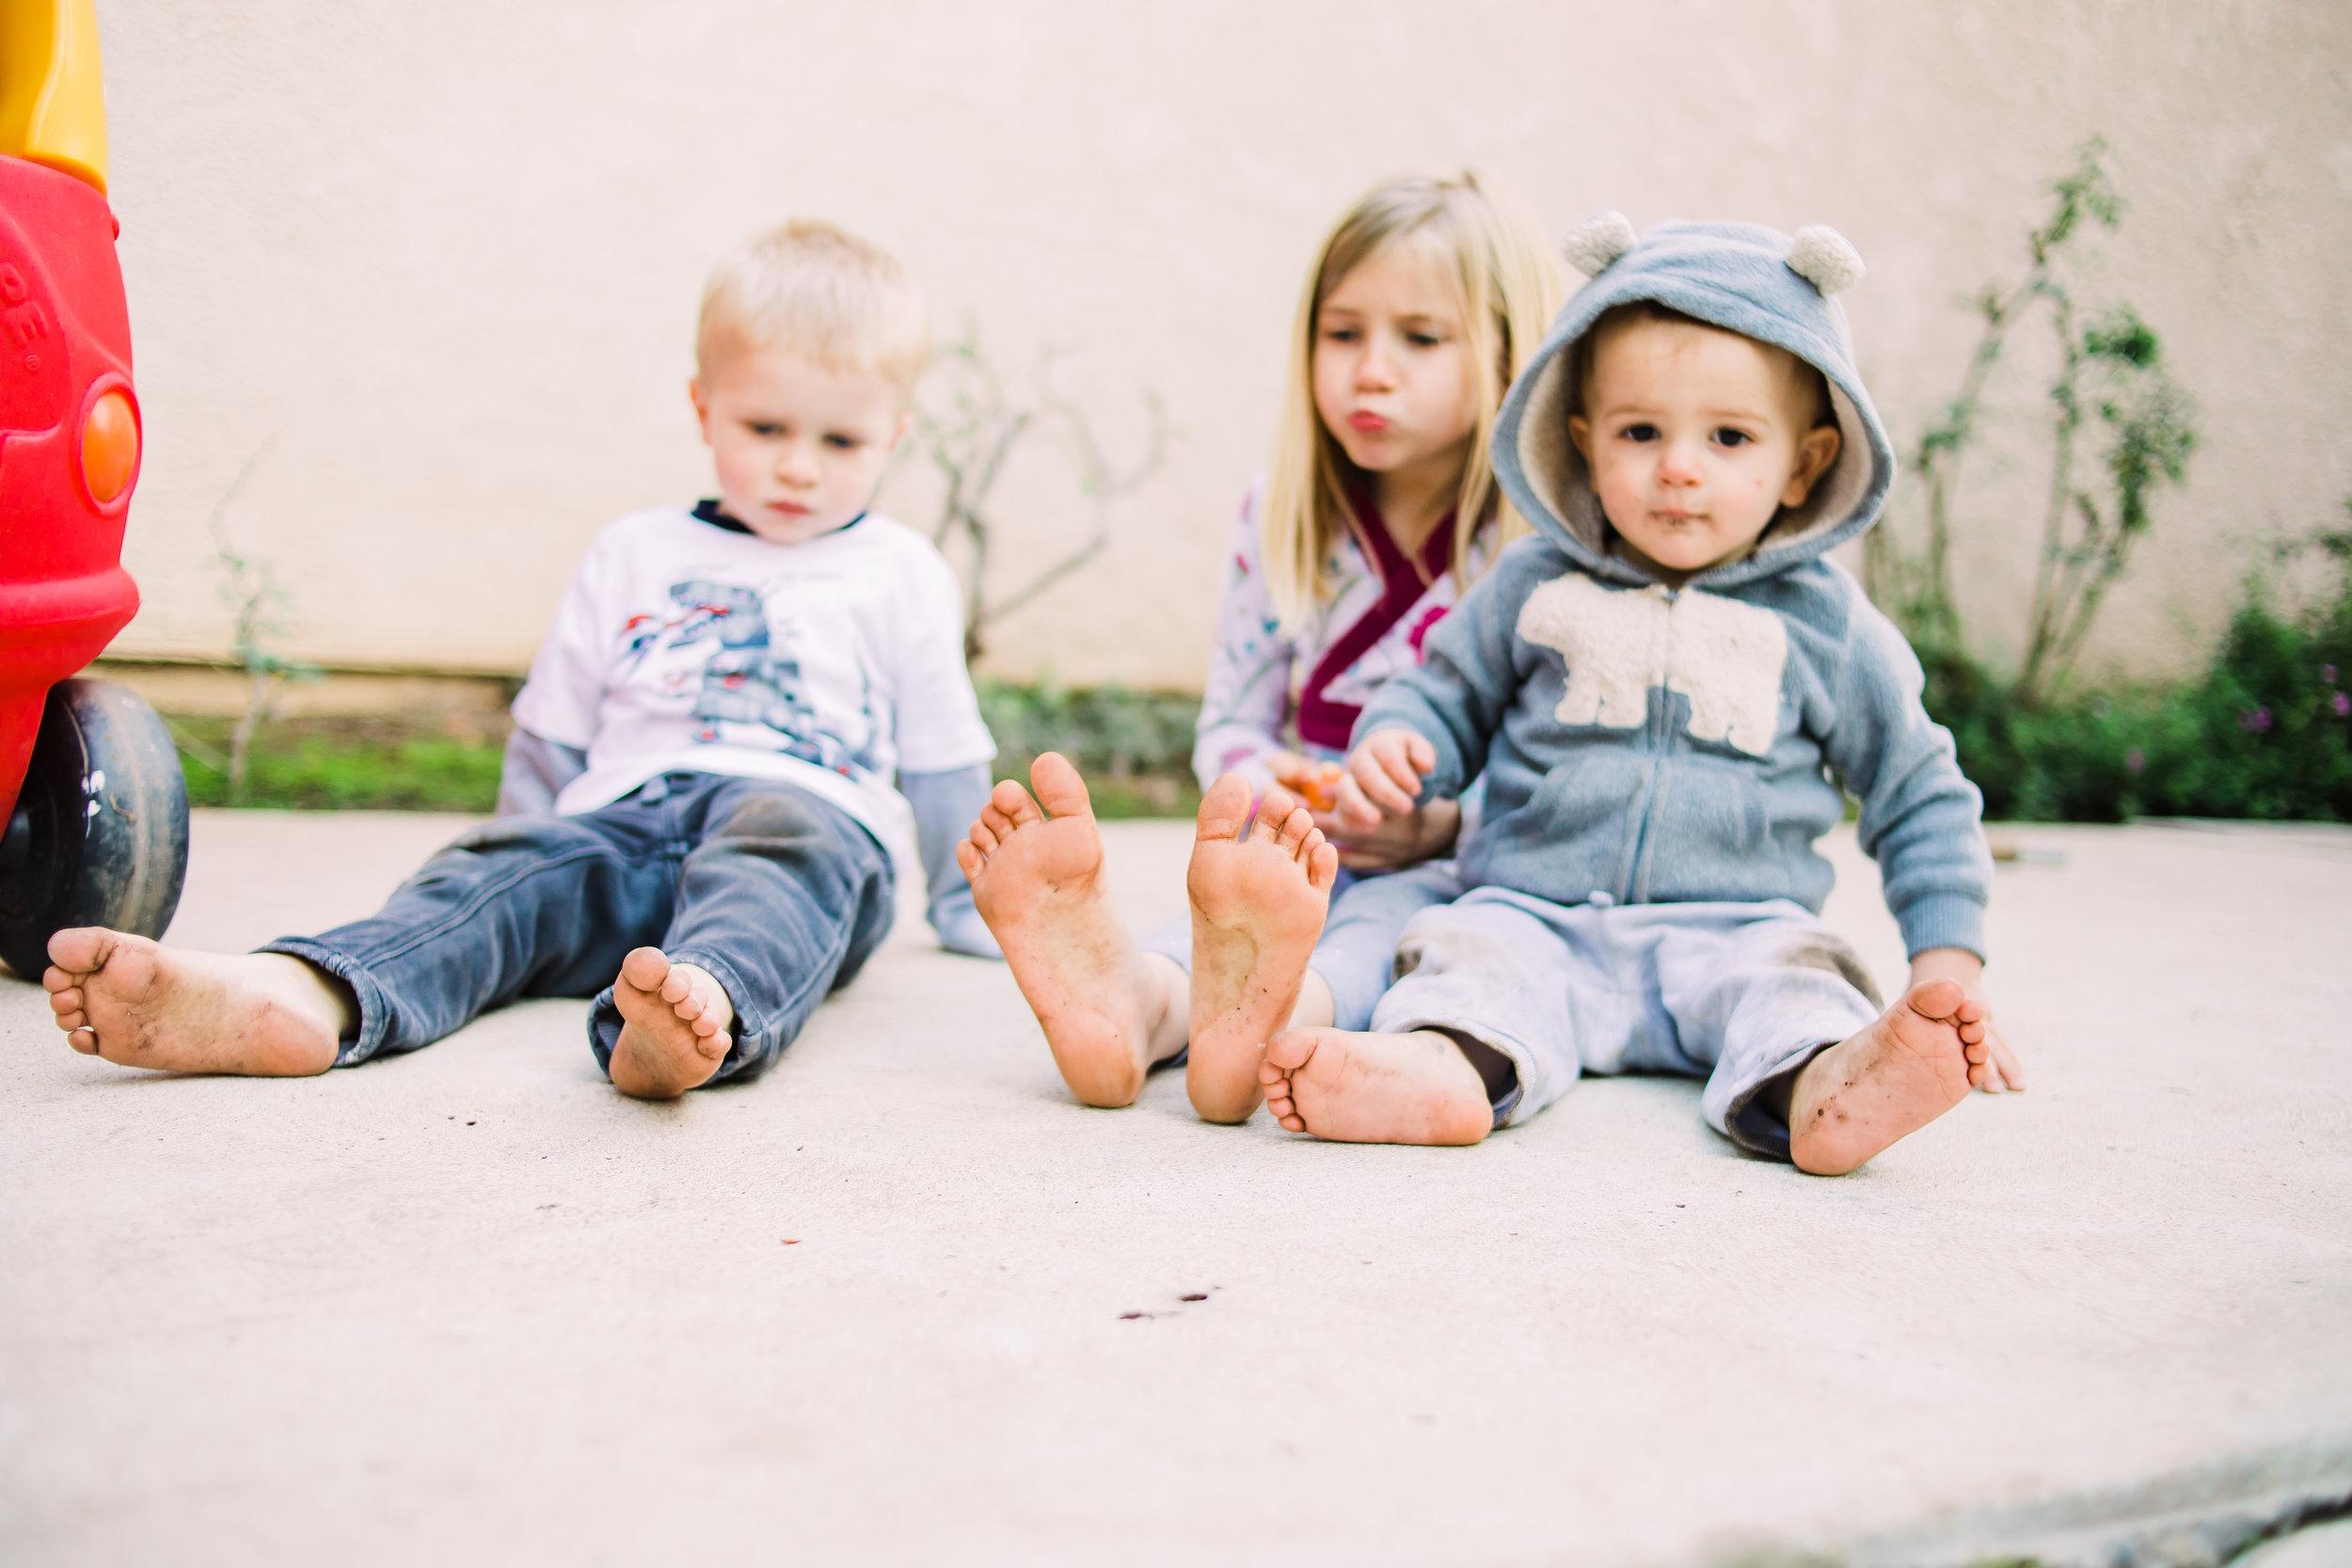 three kids sitting on a patio